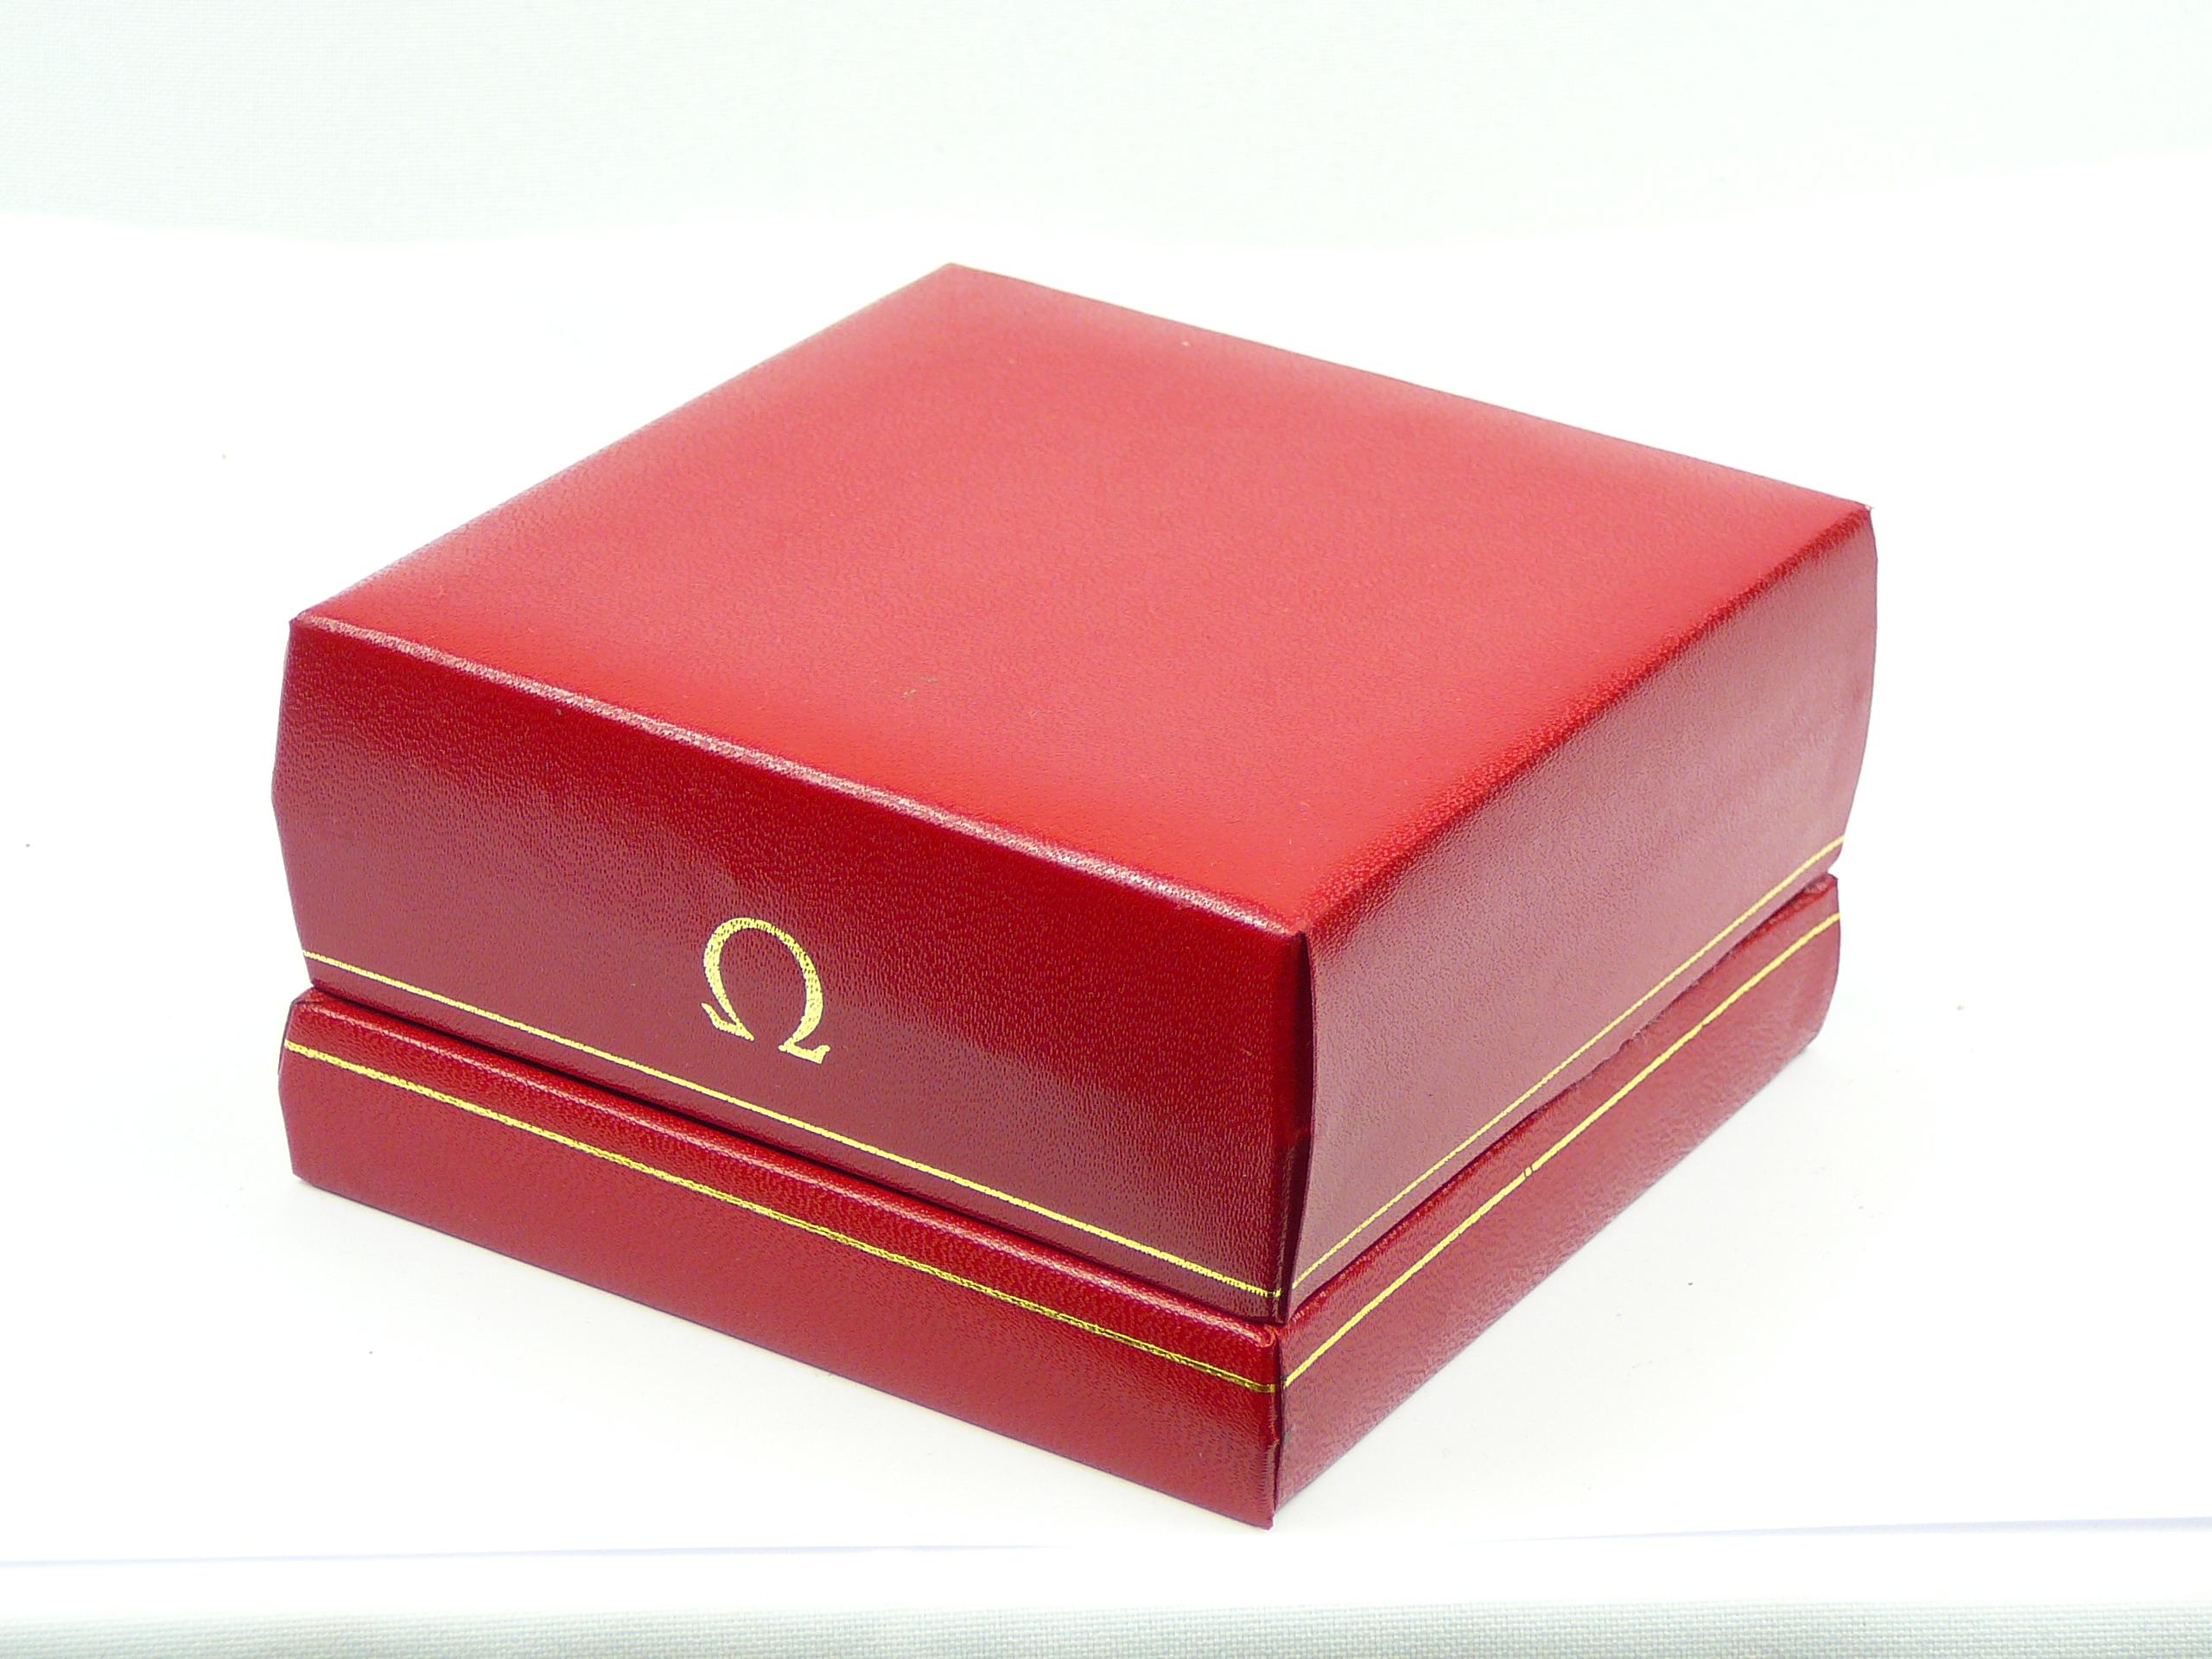 Vintage Omega watch box